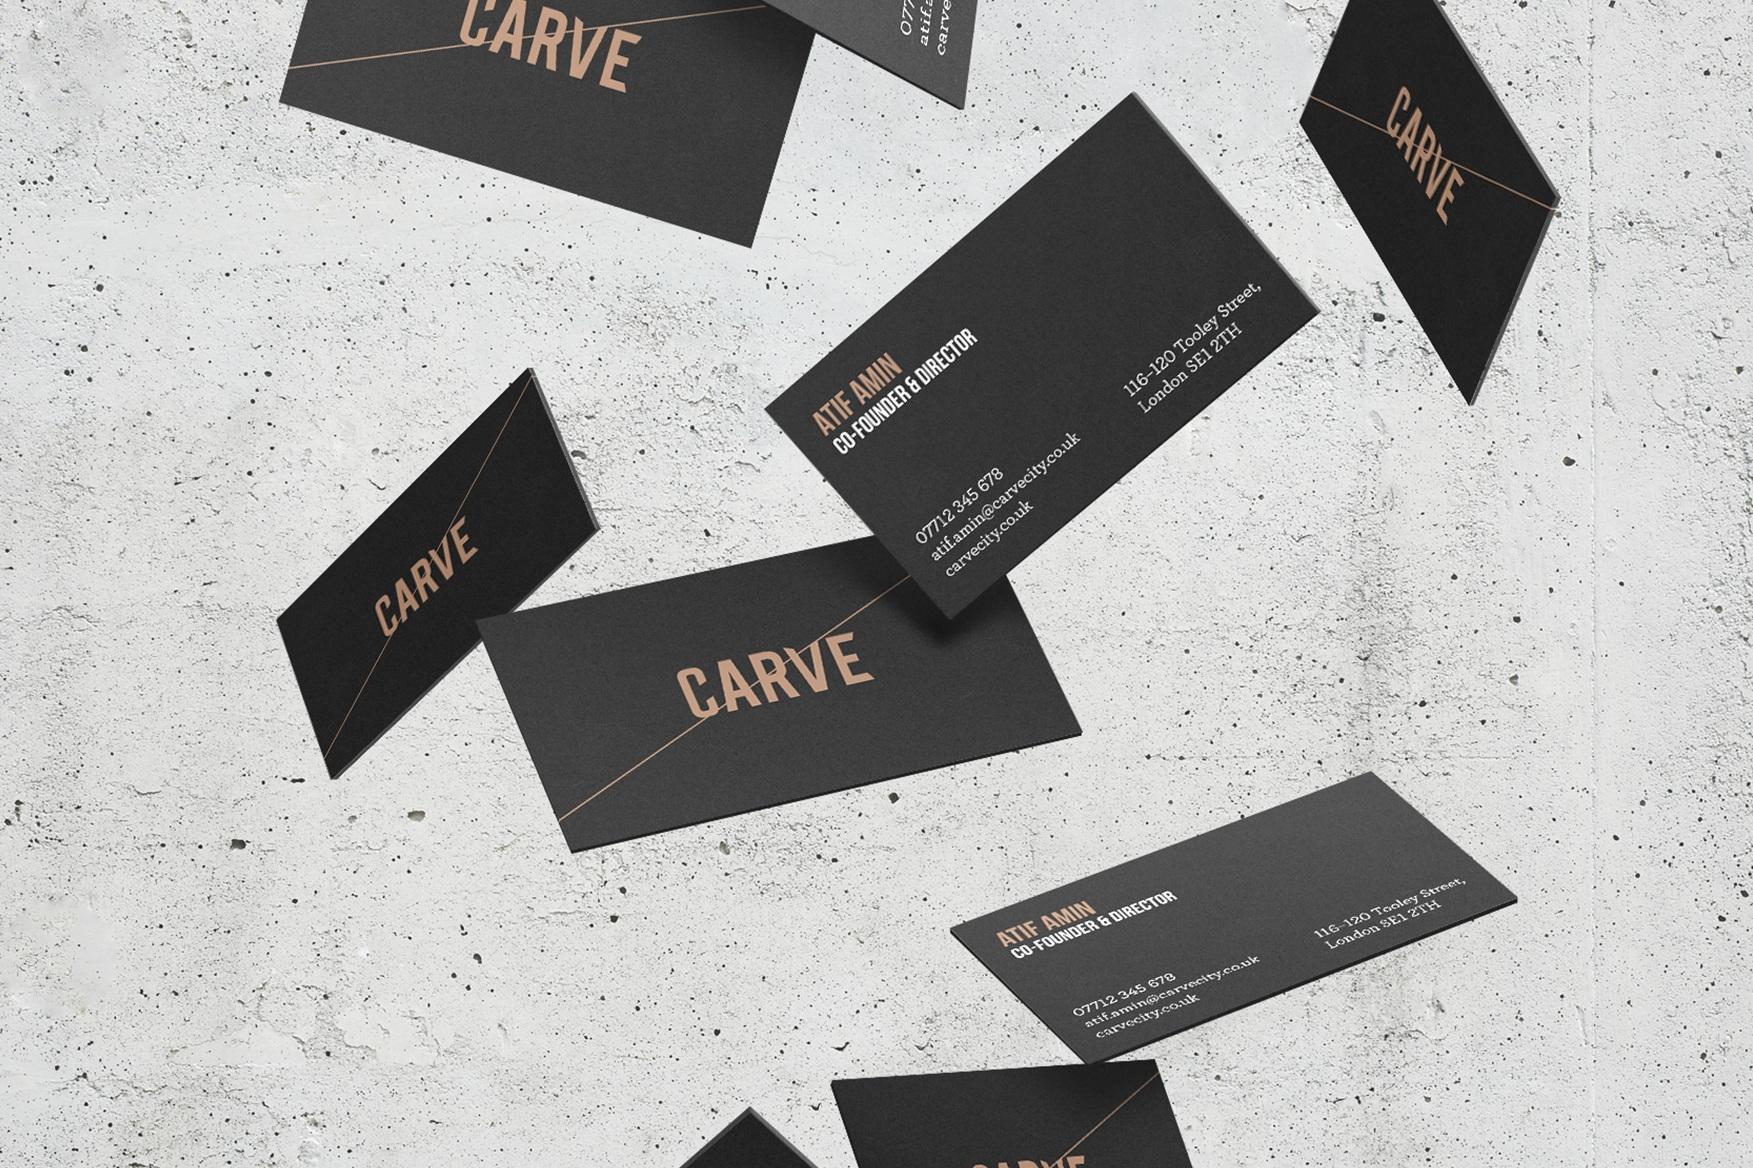 Carve+03.jpg